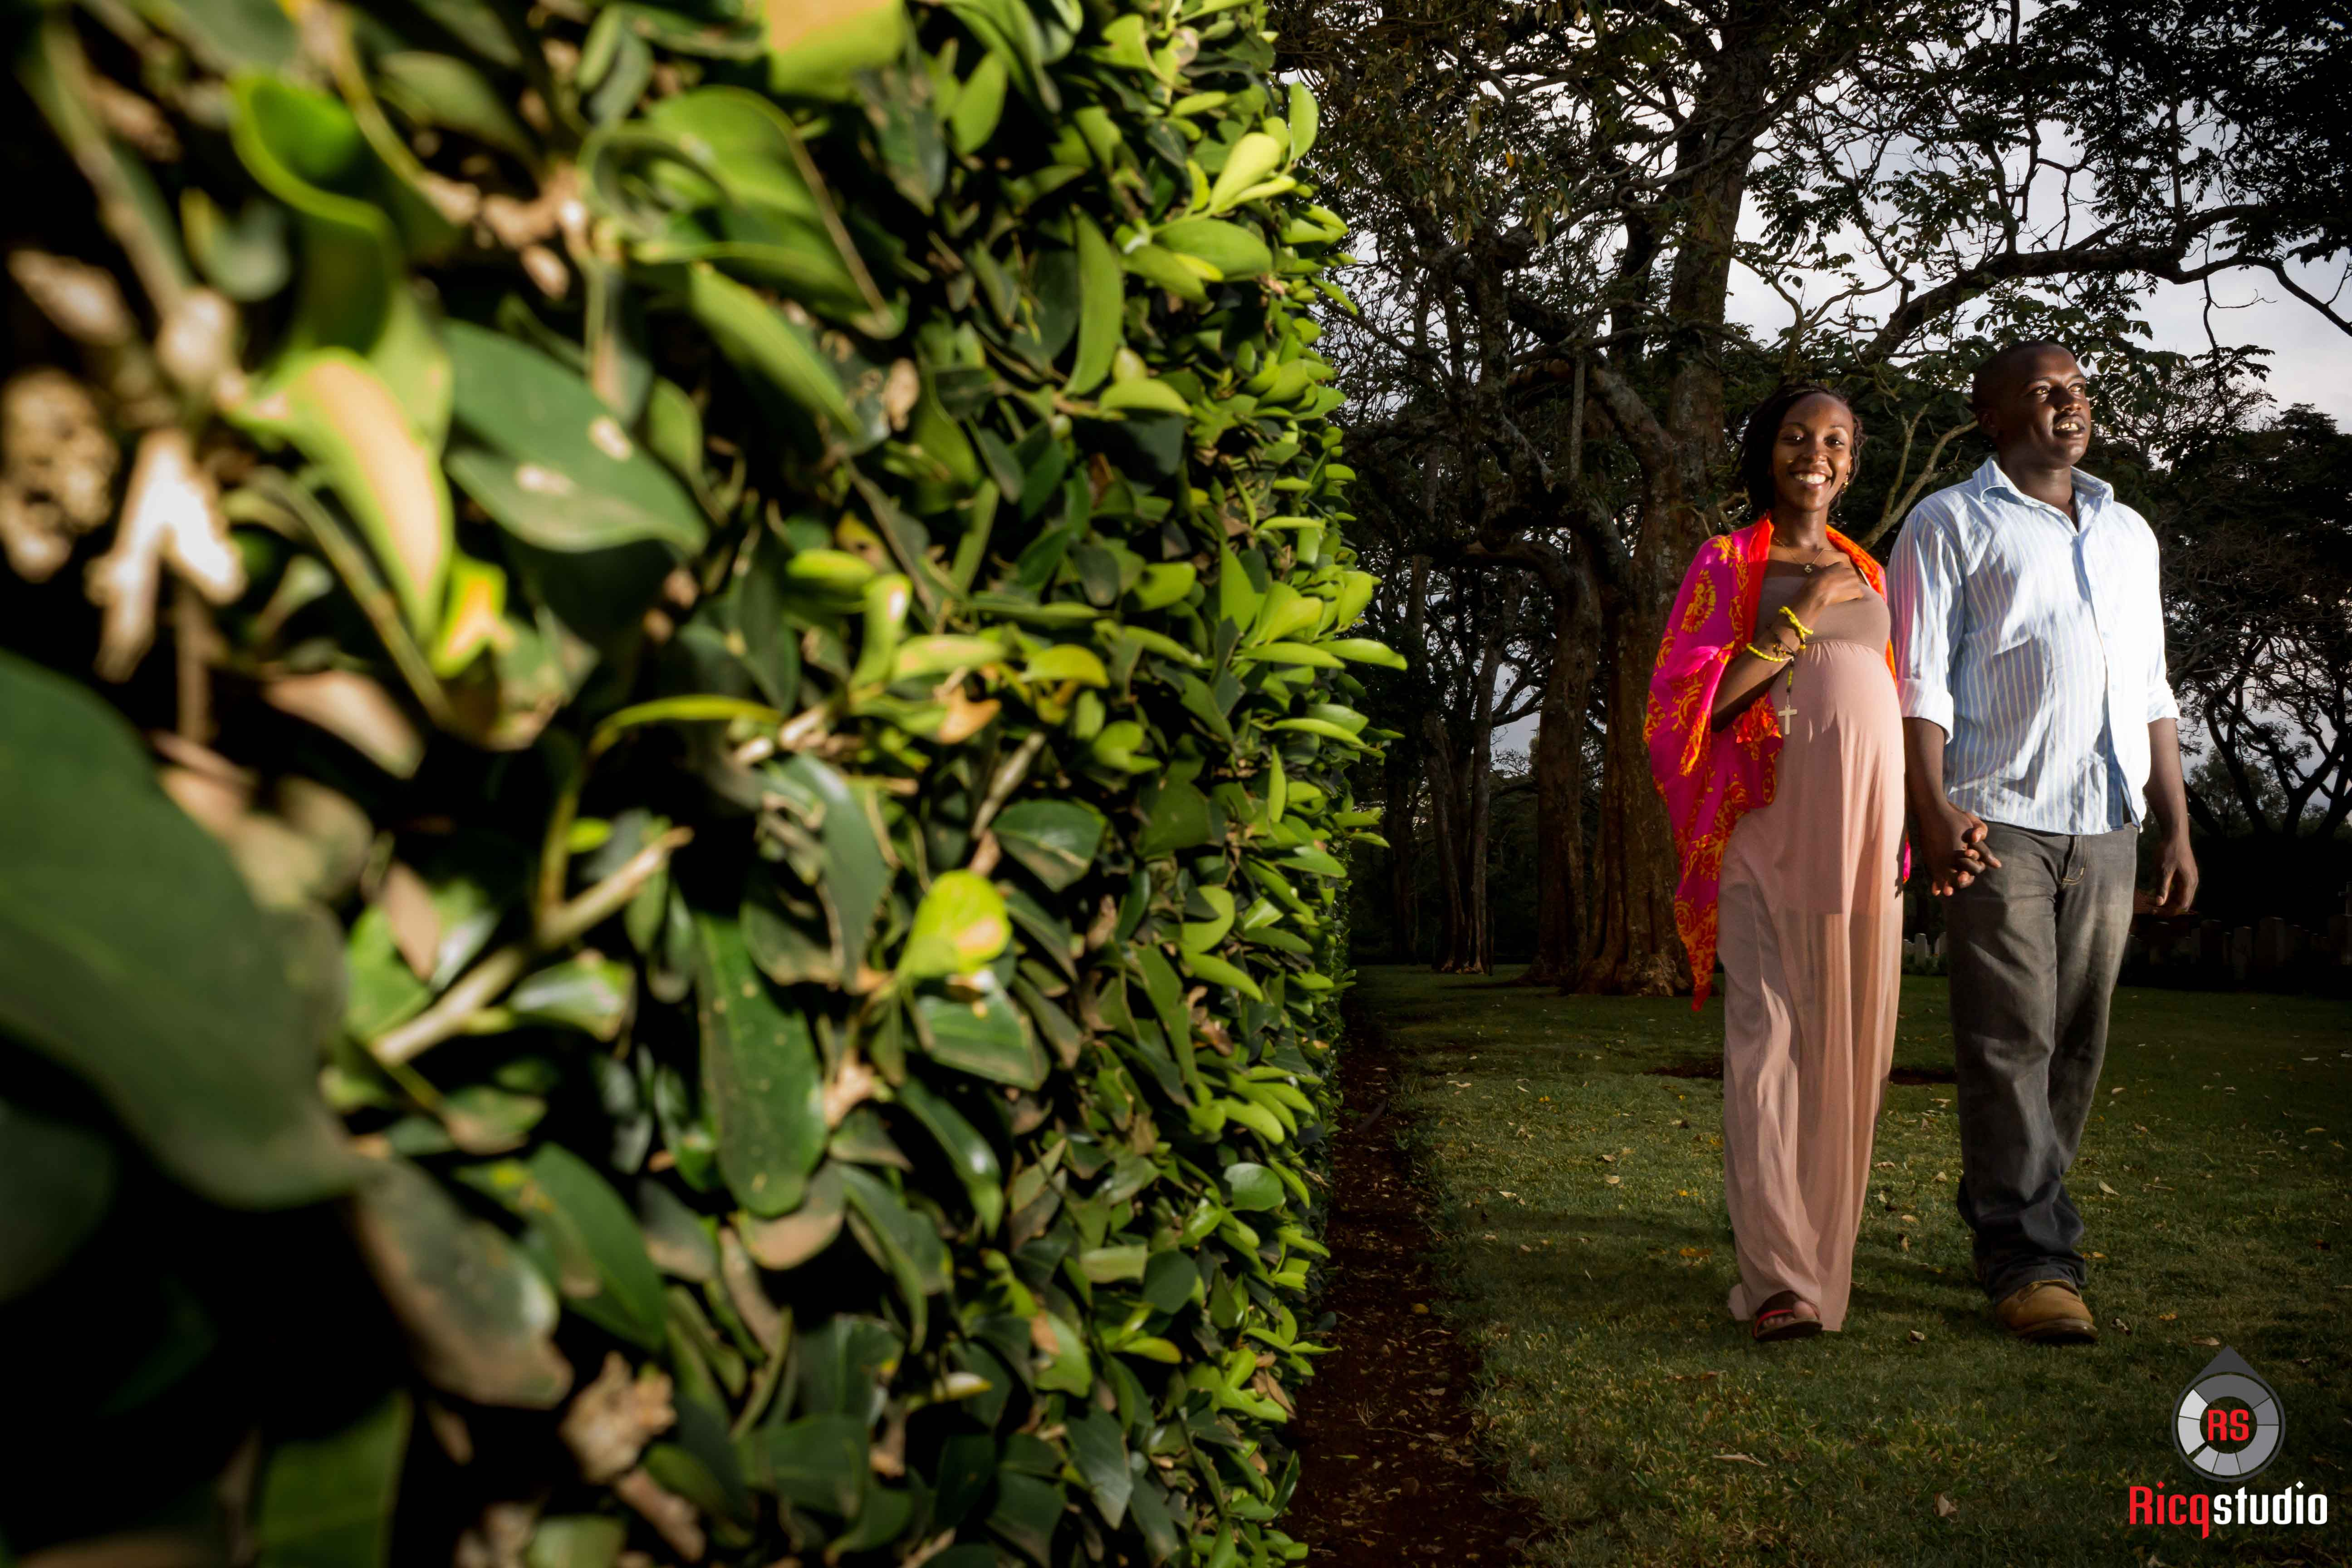 wedding photographer_ engagement in Kenya_ricqstudio-65